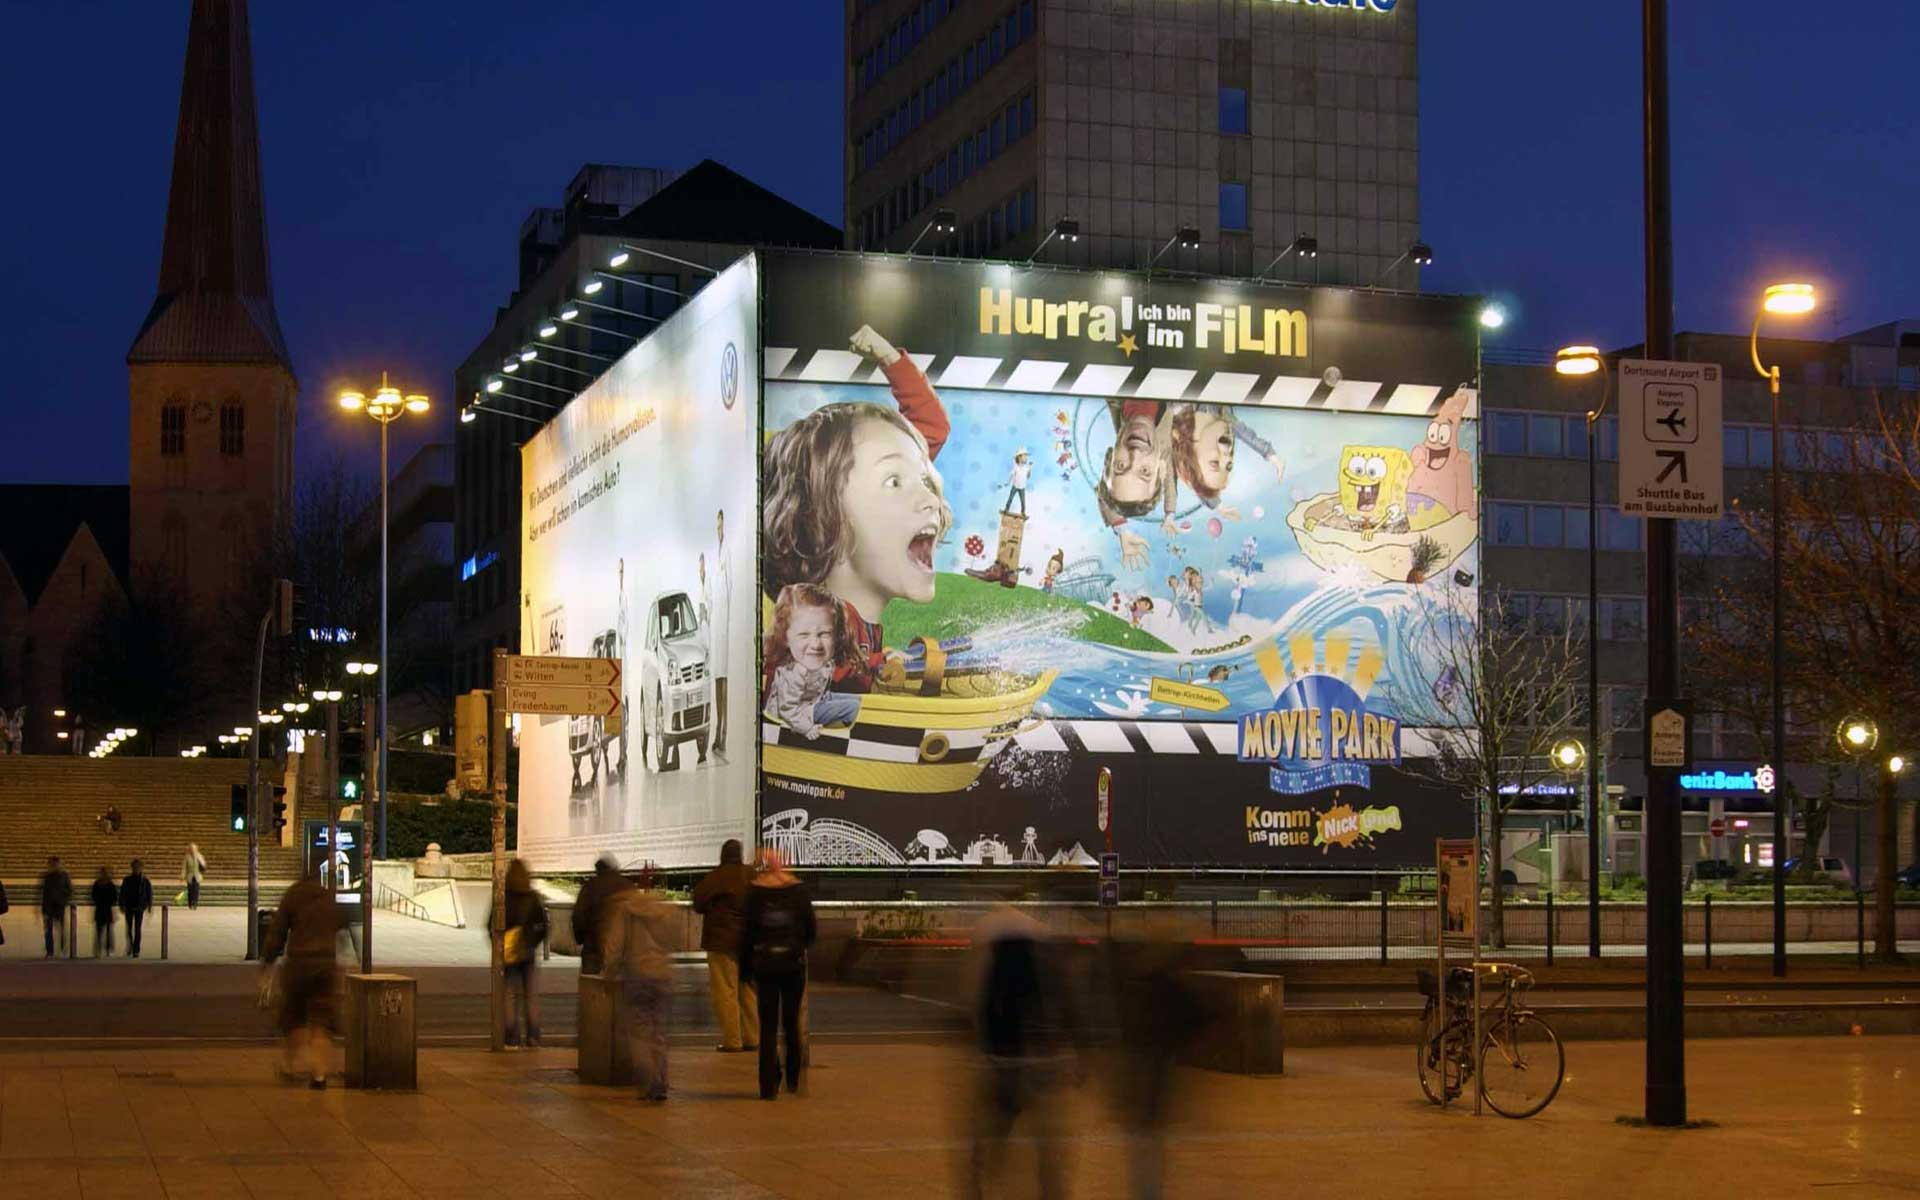 Plakatwerbung am Hauptbahnhof Dortmund